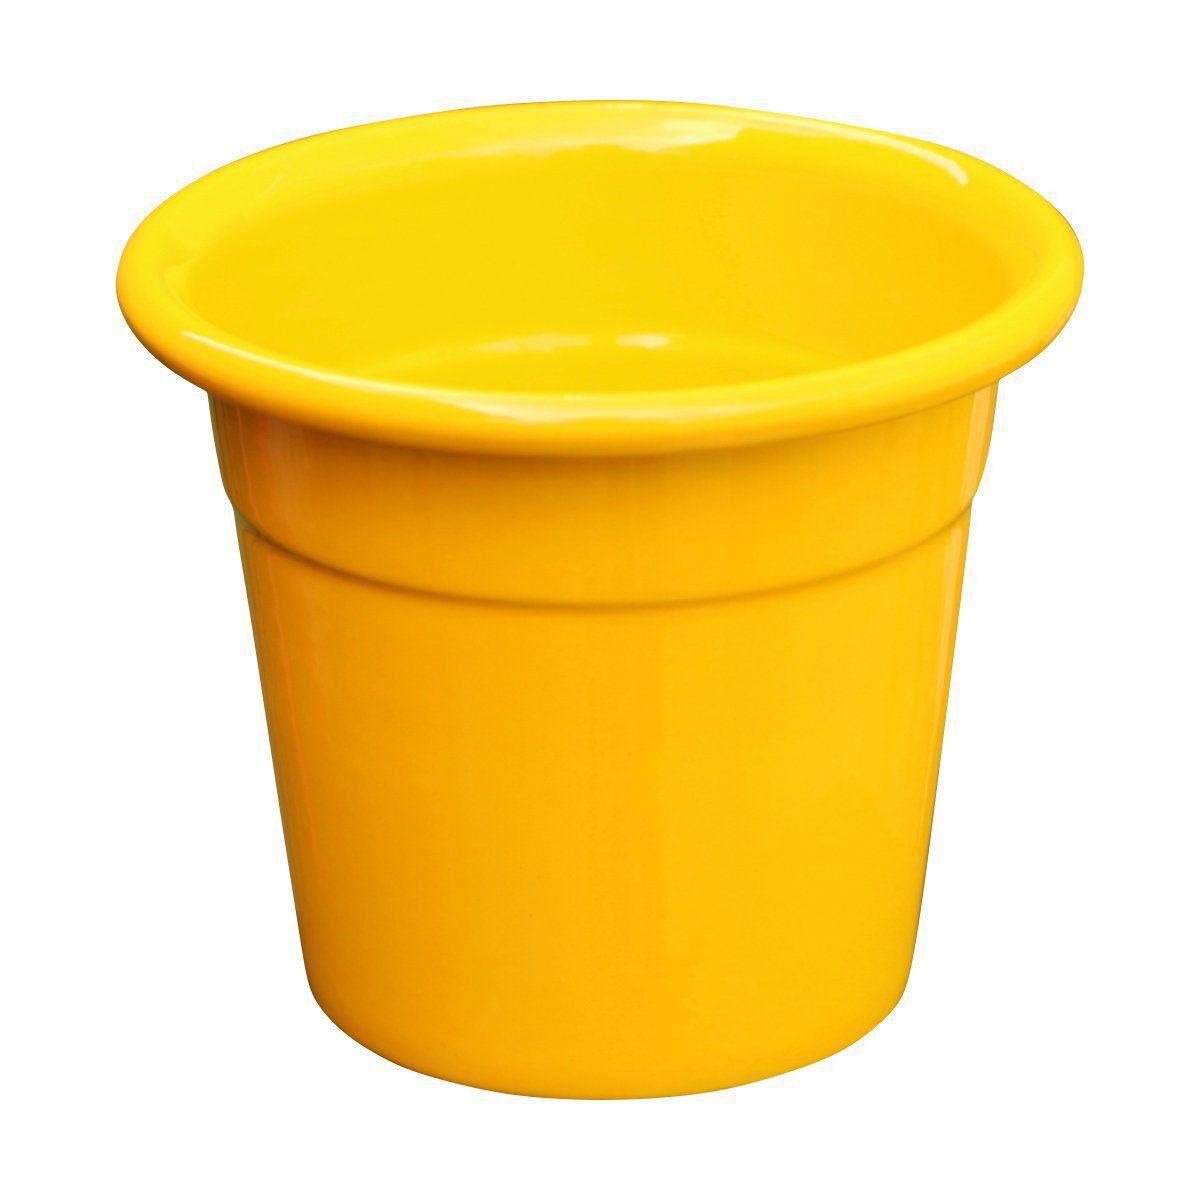 Cachepô de Alumínio Soleil Nº 8 Amarelo 7,5cm x 9cm